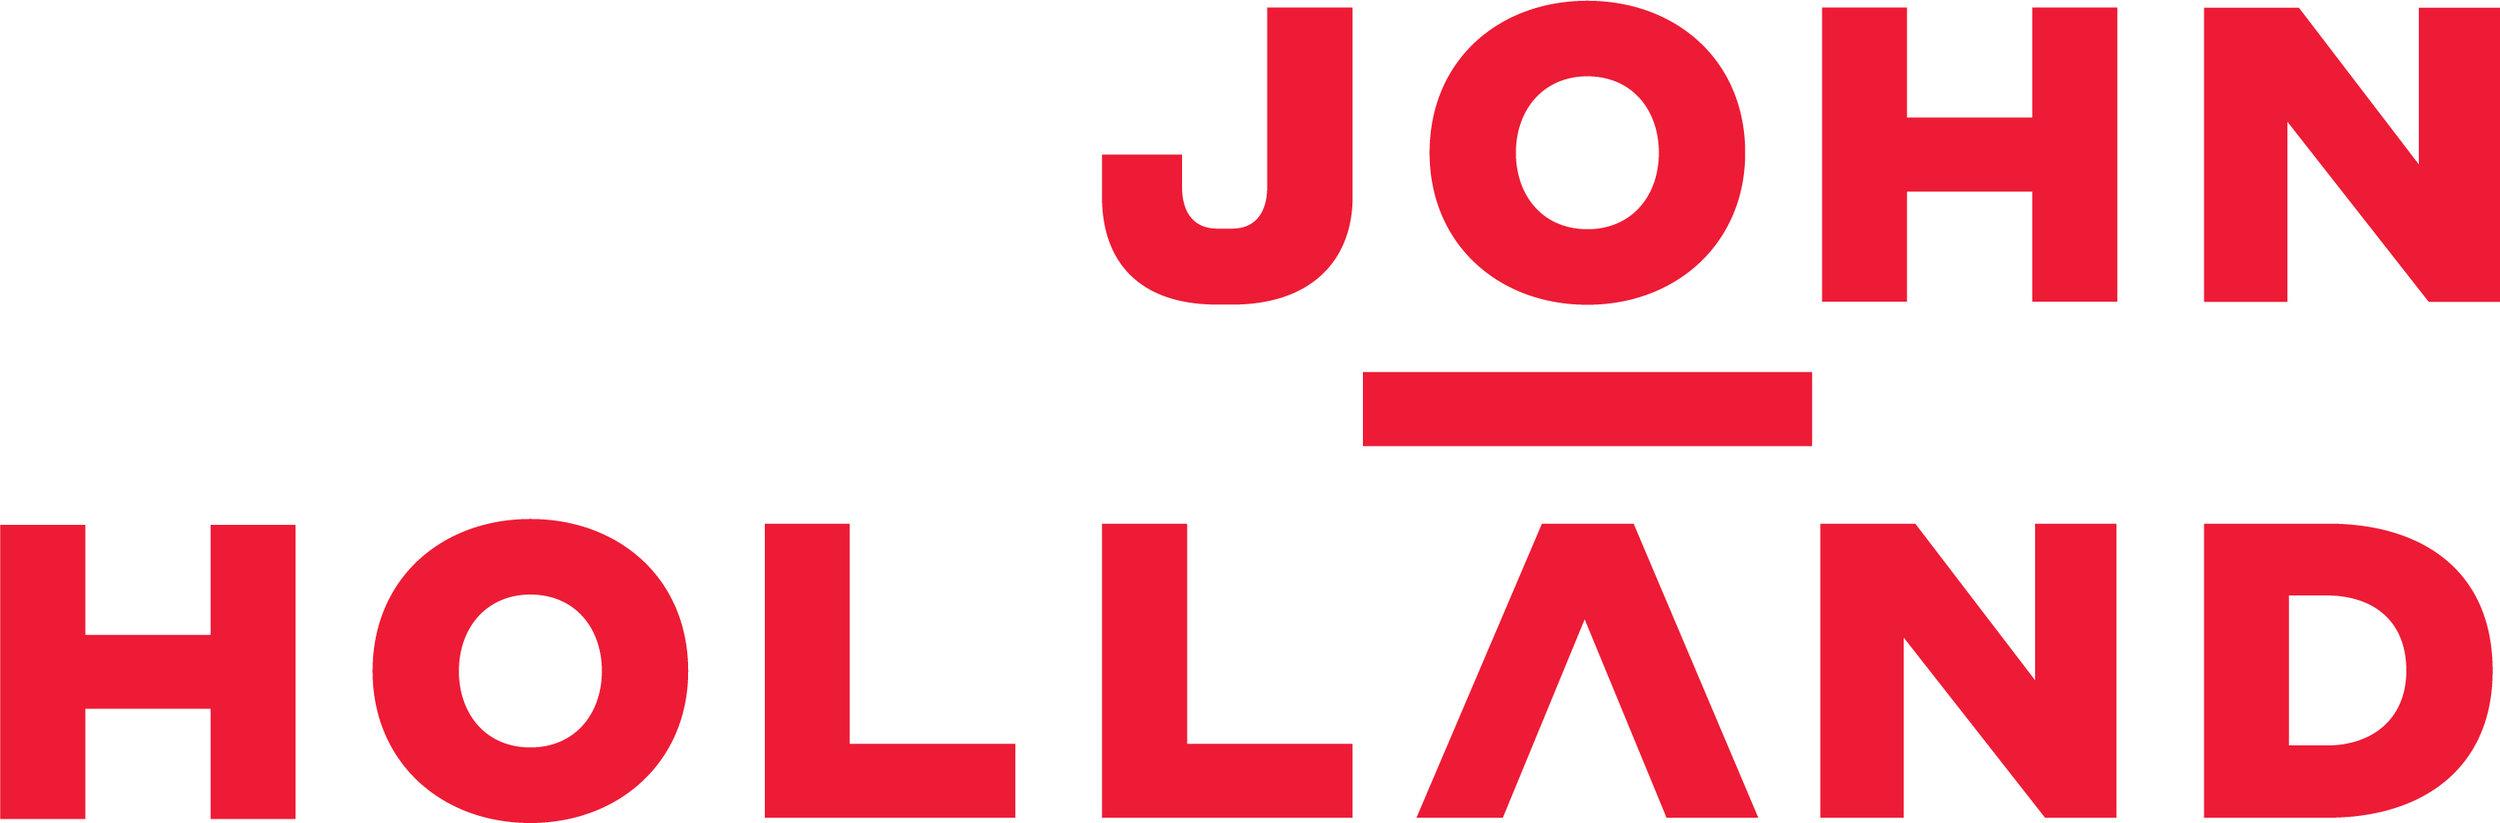 John Holland Logo.jpg